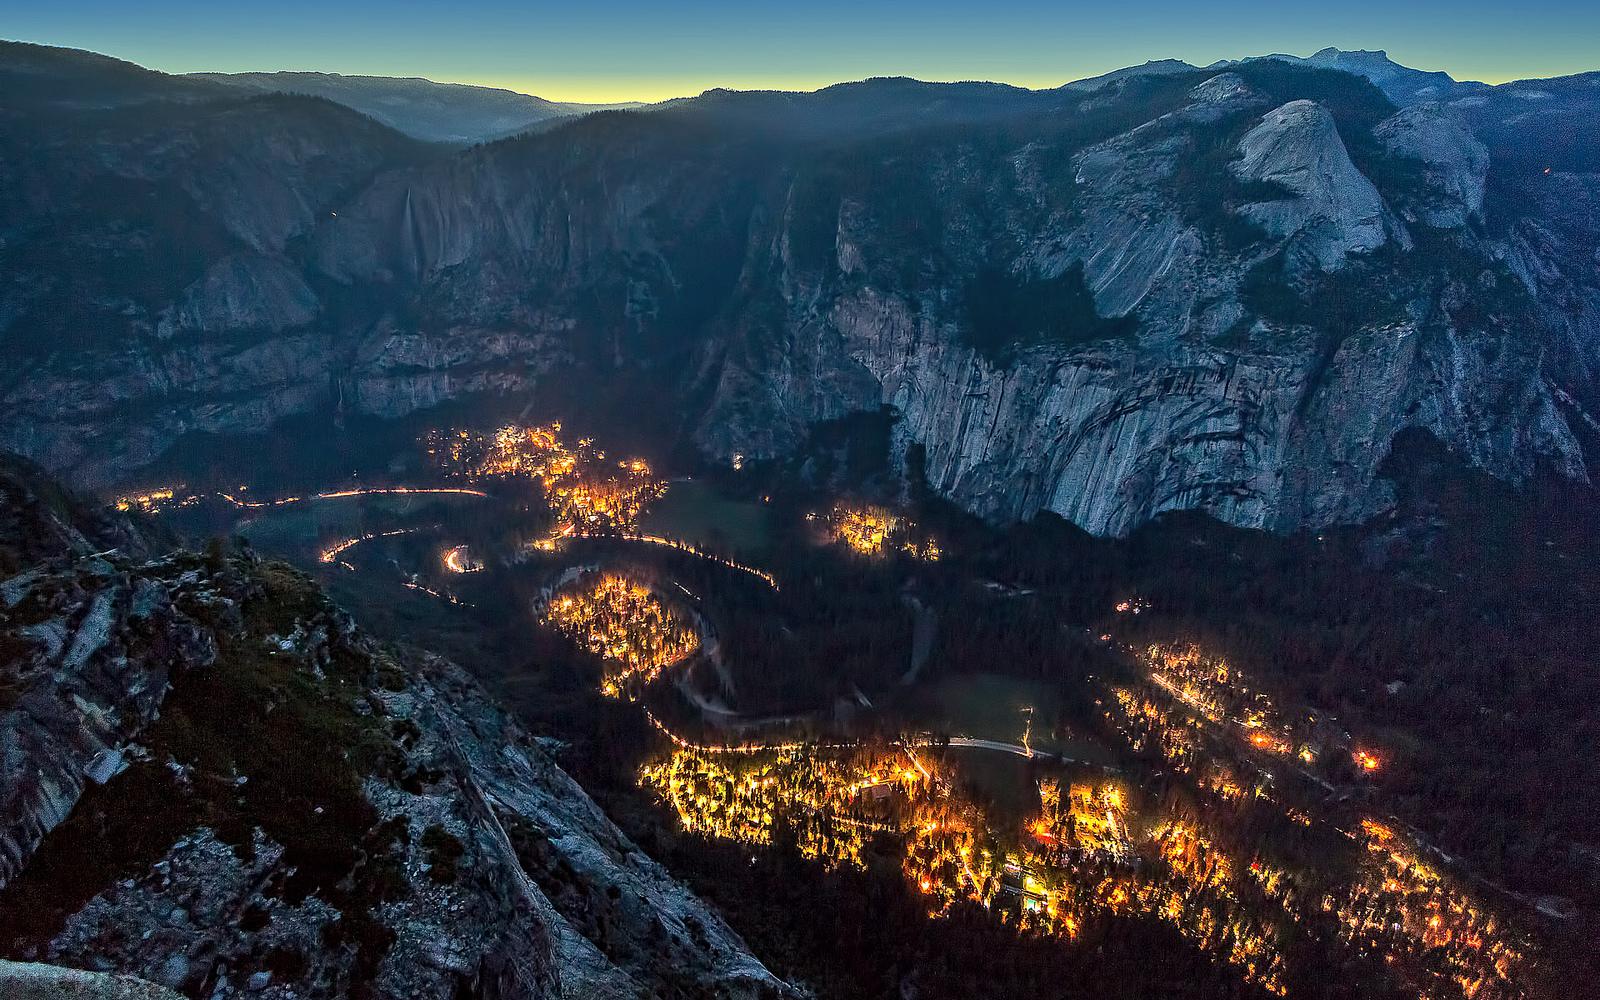 Yosemite Valley, USA